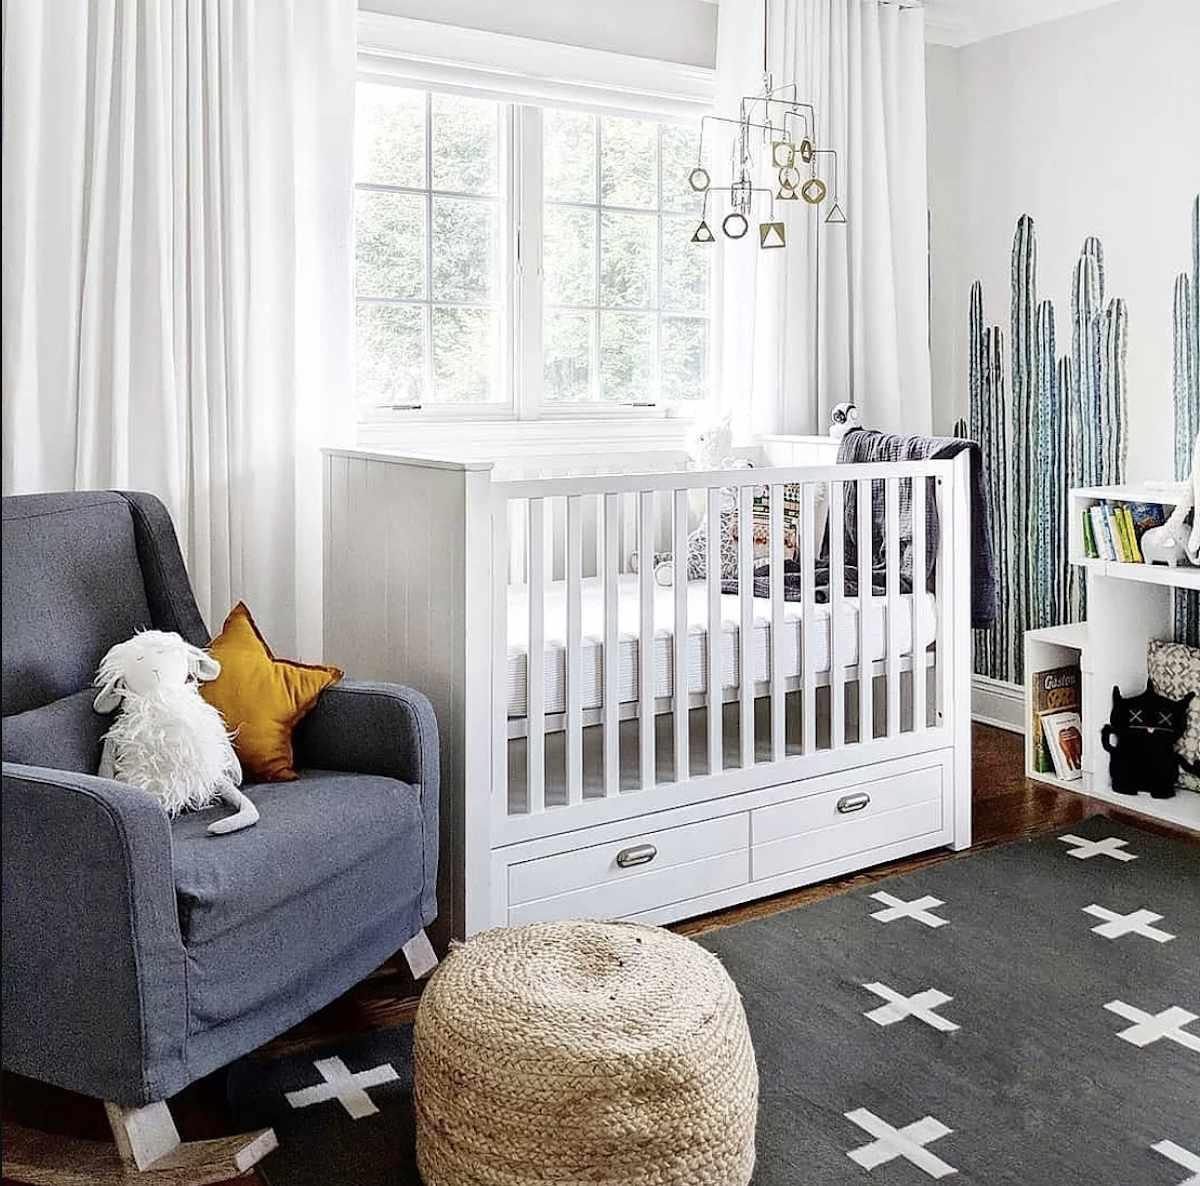 crib with storage drawers underneath